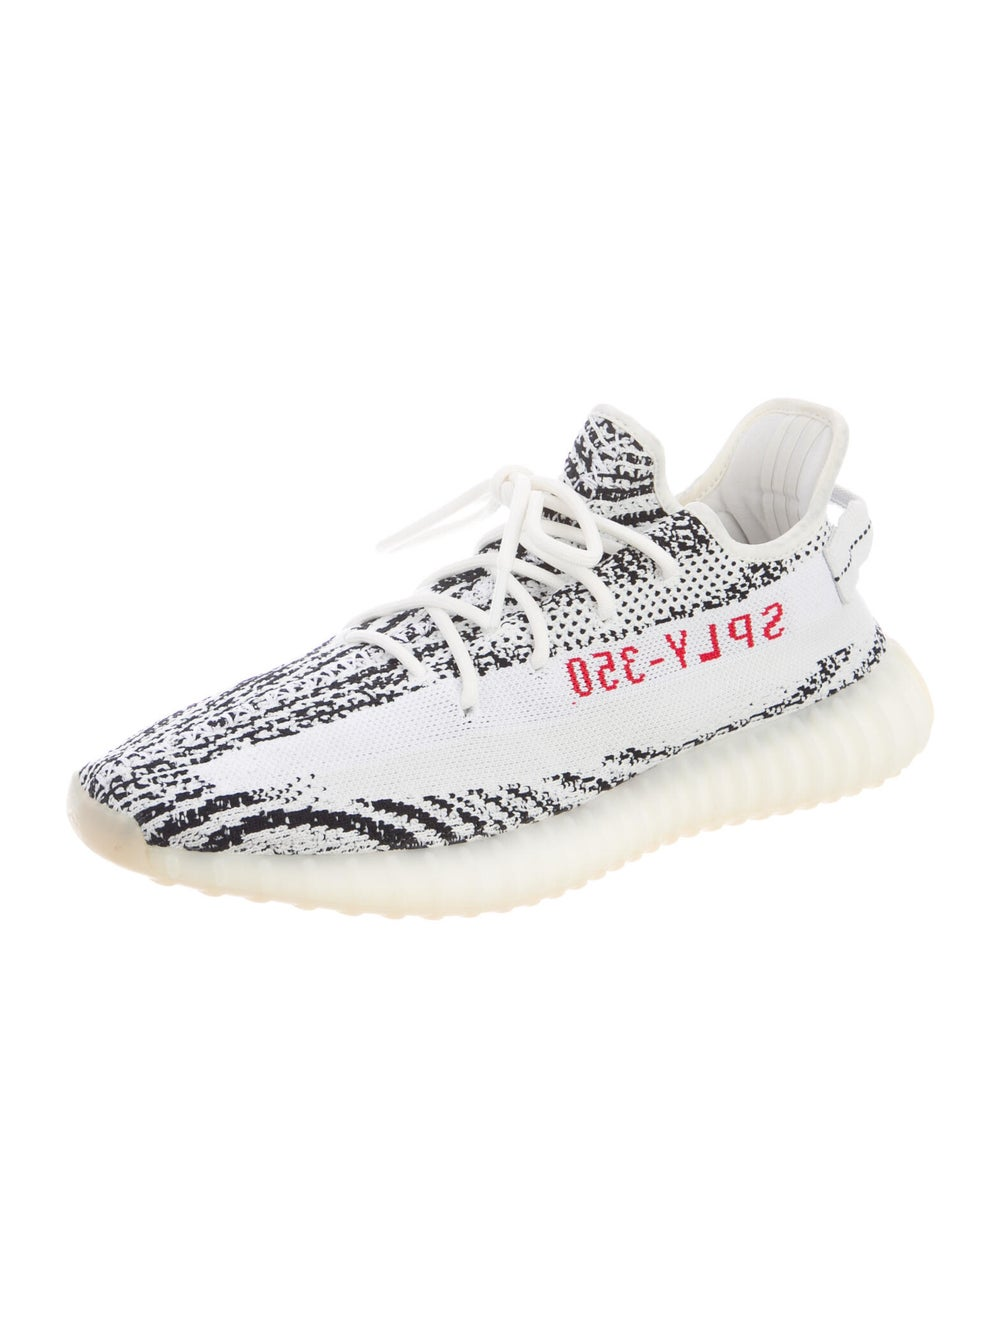 Yeezy Yeezy Boost 350 V2 Zebra Sneakers Black - image 2